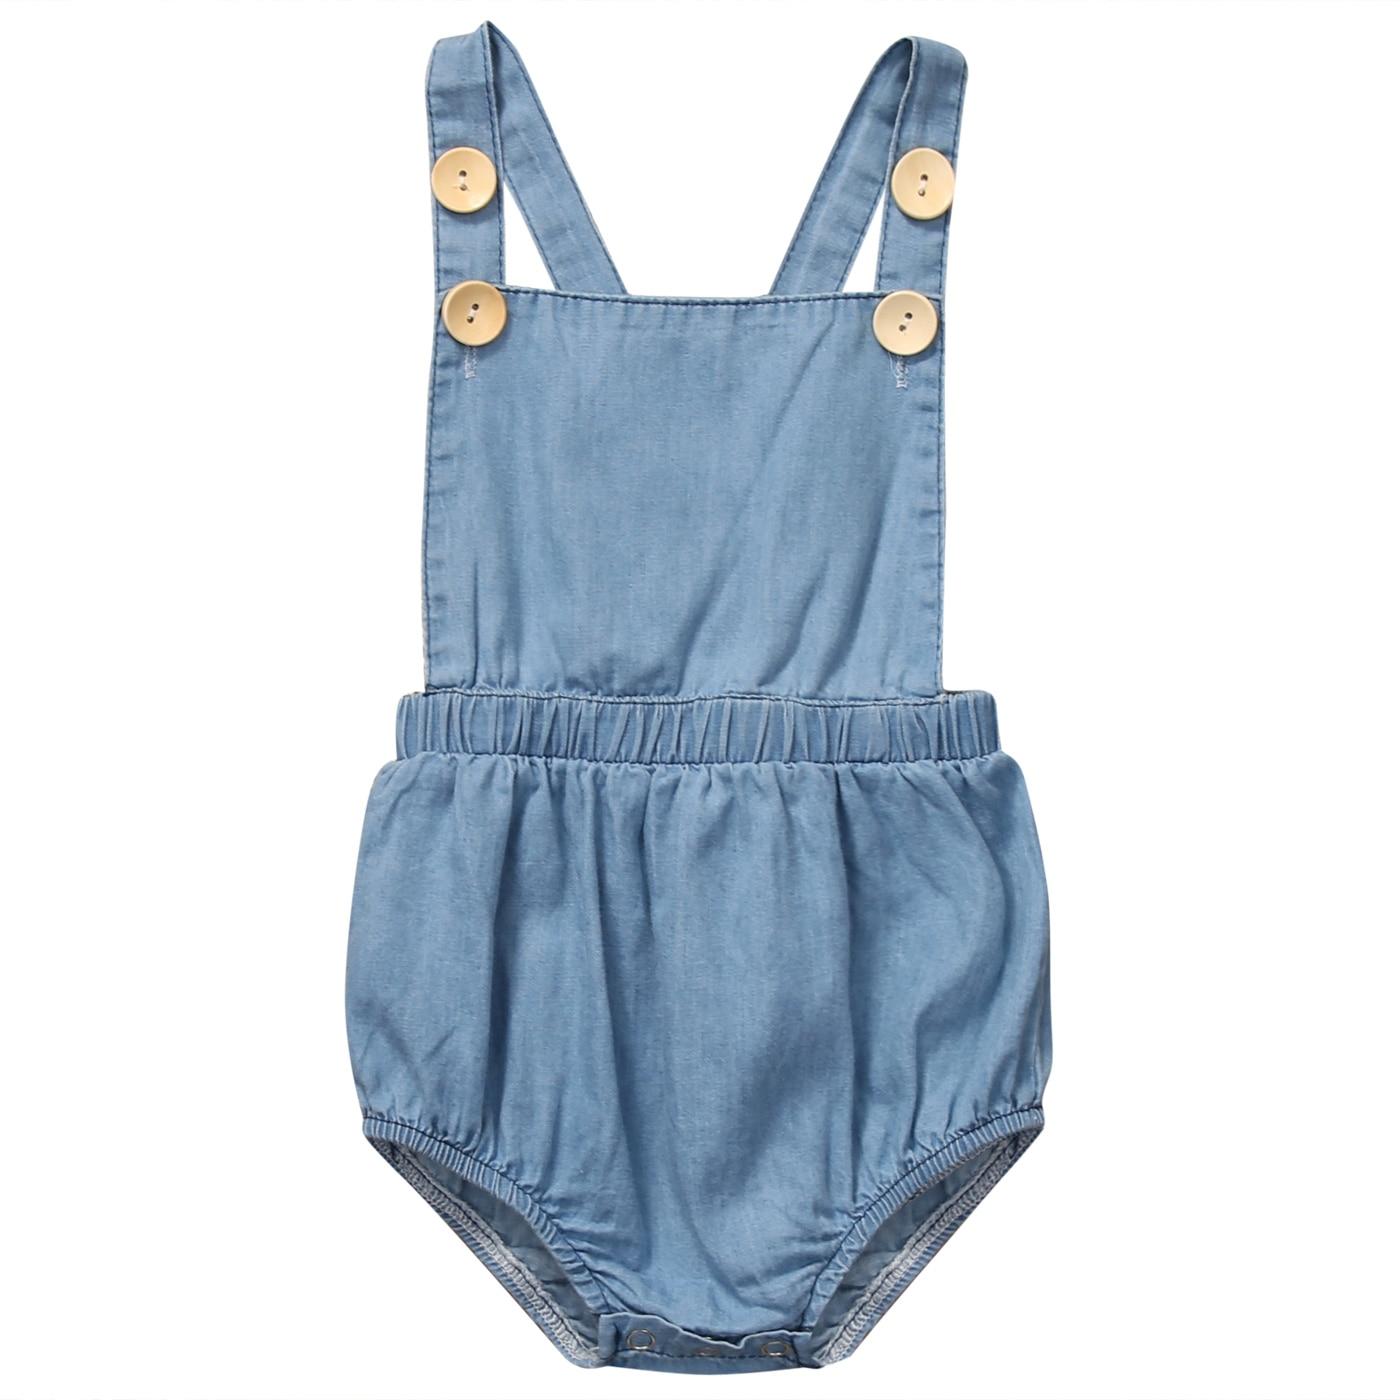 Adorable Baby Girl Romper Fashion Denim Romper Kids Jumpsuit Sleeveless Blue Jumper Sunsuit Outfits Clothes